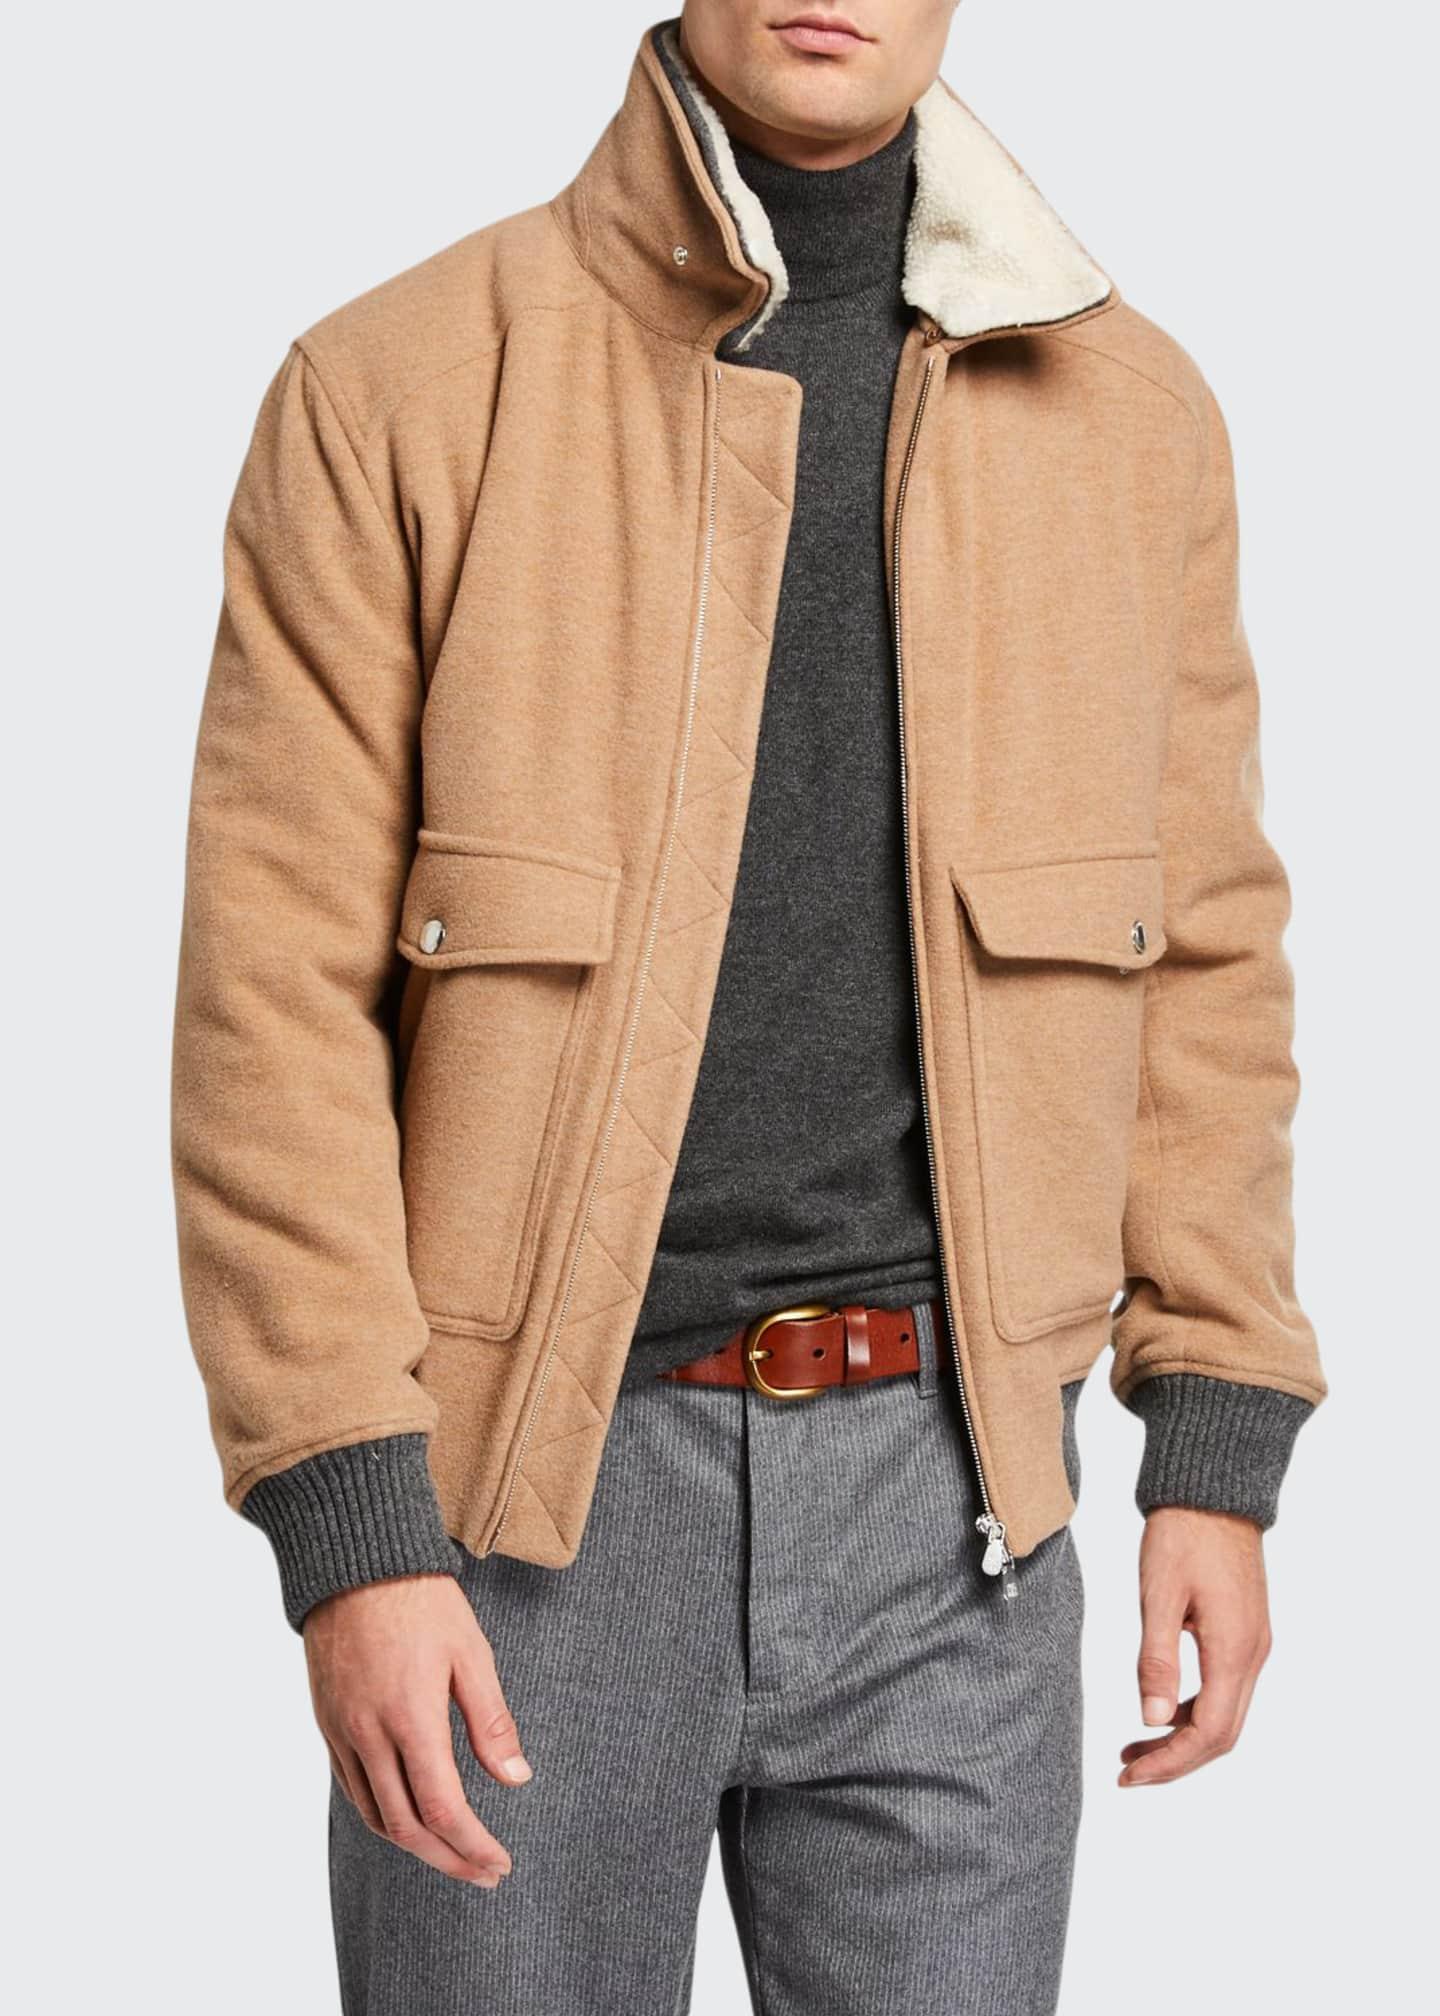 Brunello Cucinelli Men's Bomber-Style Patch-Pocket Jacket